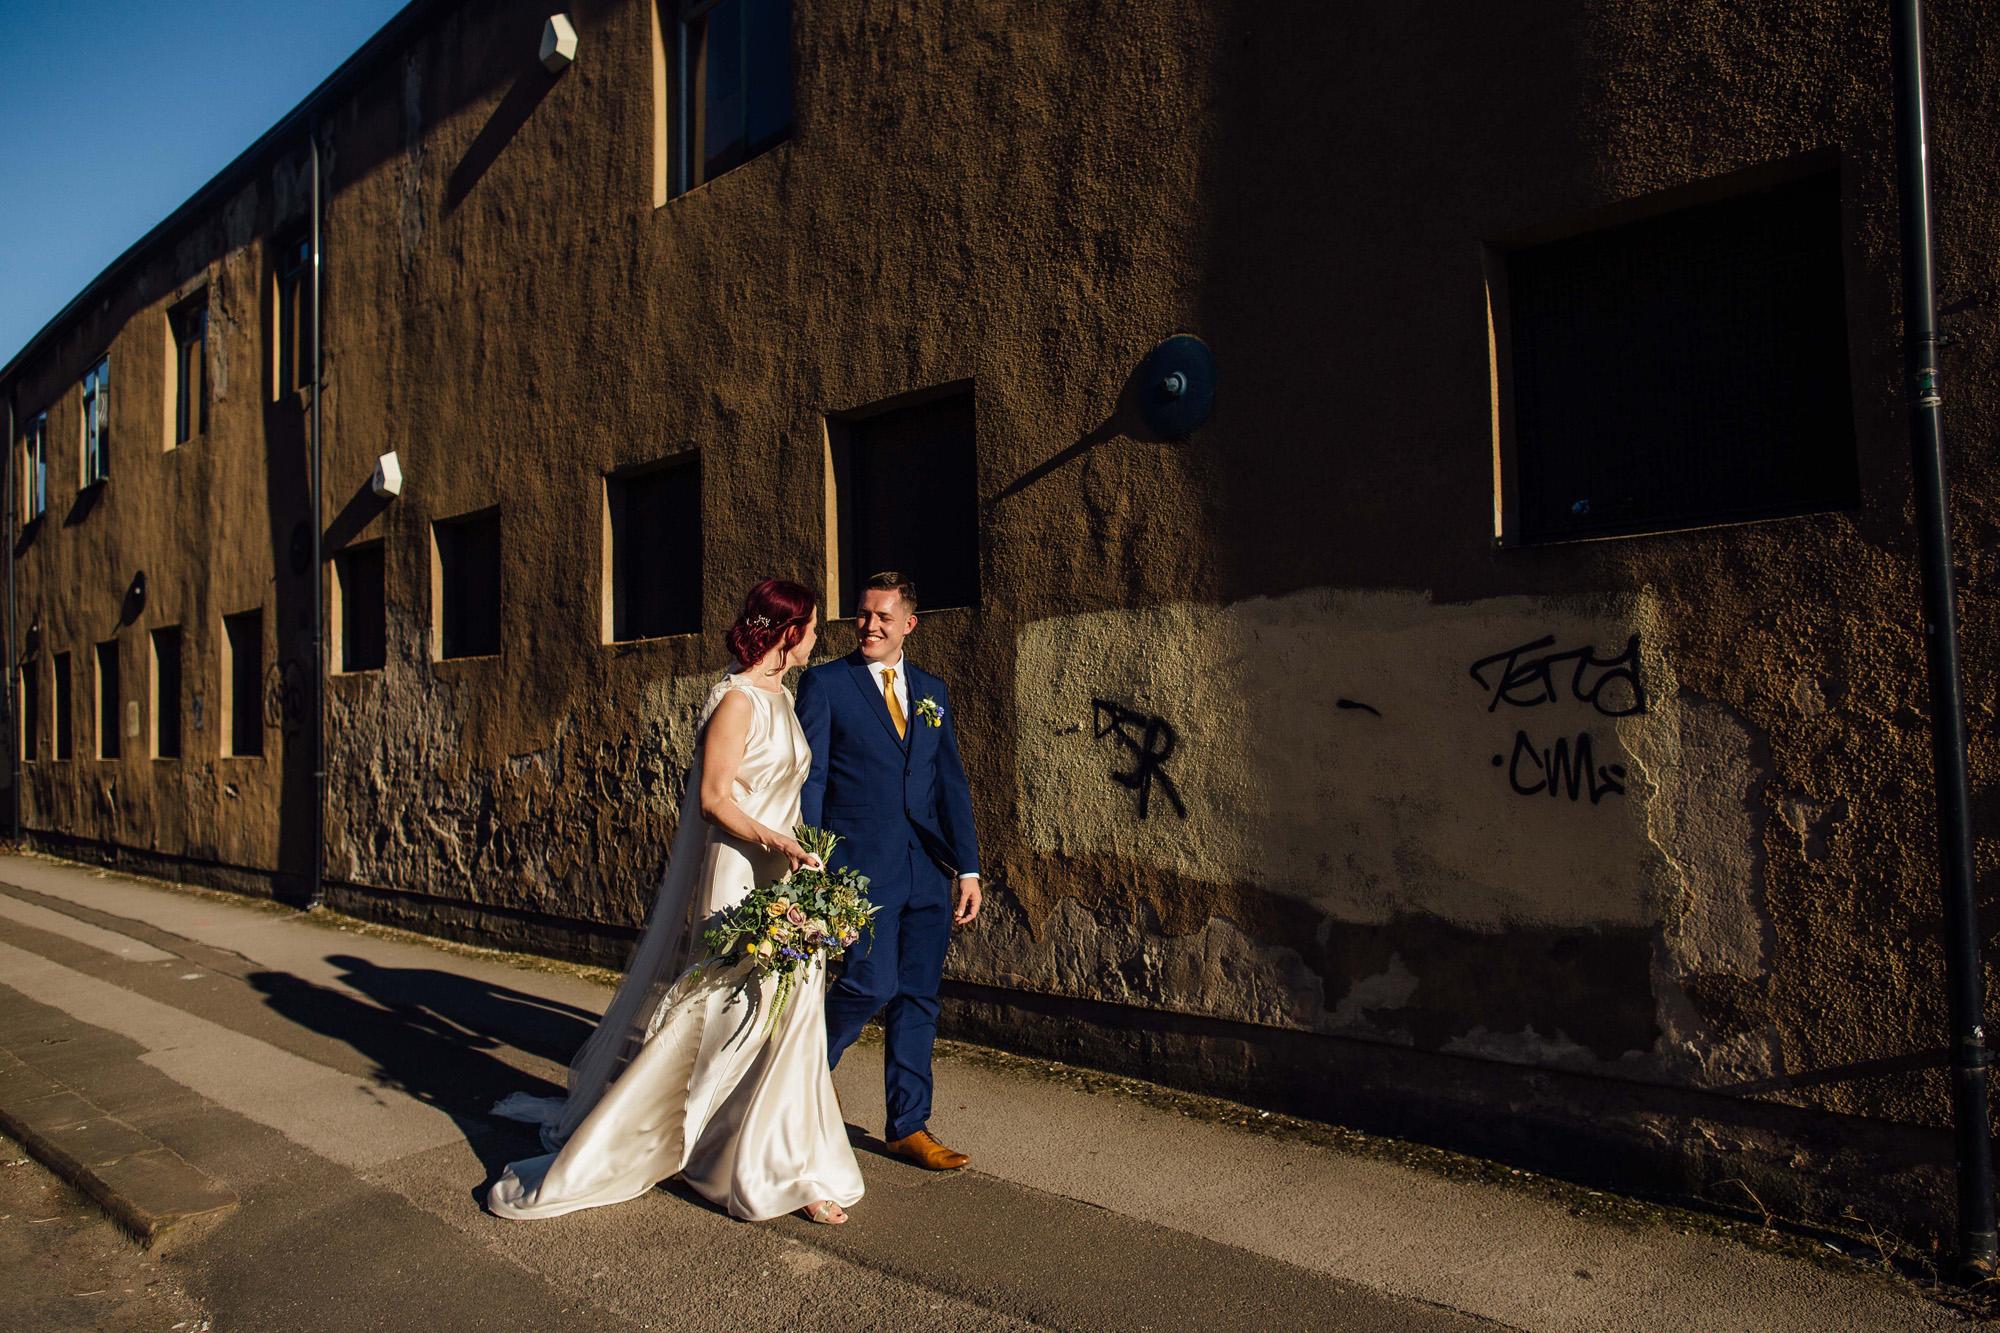 Sarah-Honeysuckle-Bias-Cut-Silk-Vintage-Inspired-Wedding-Gown-Sheffield-Wedding-Kate-Beaumont-53.jpg